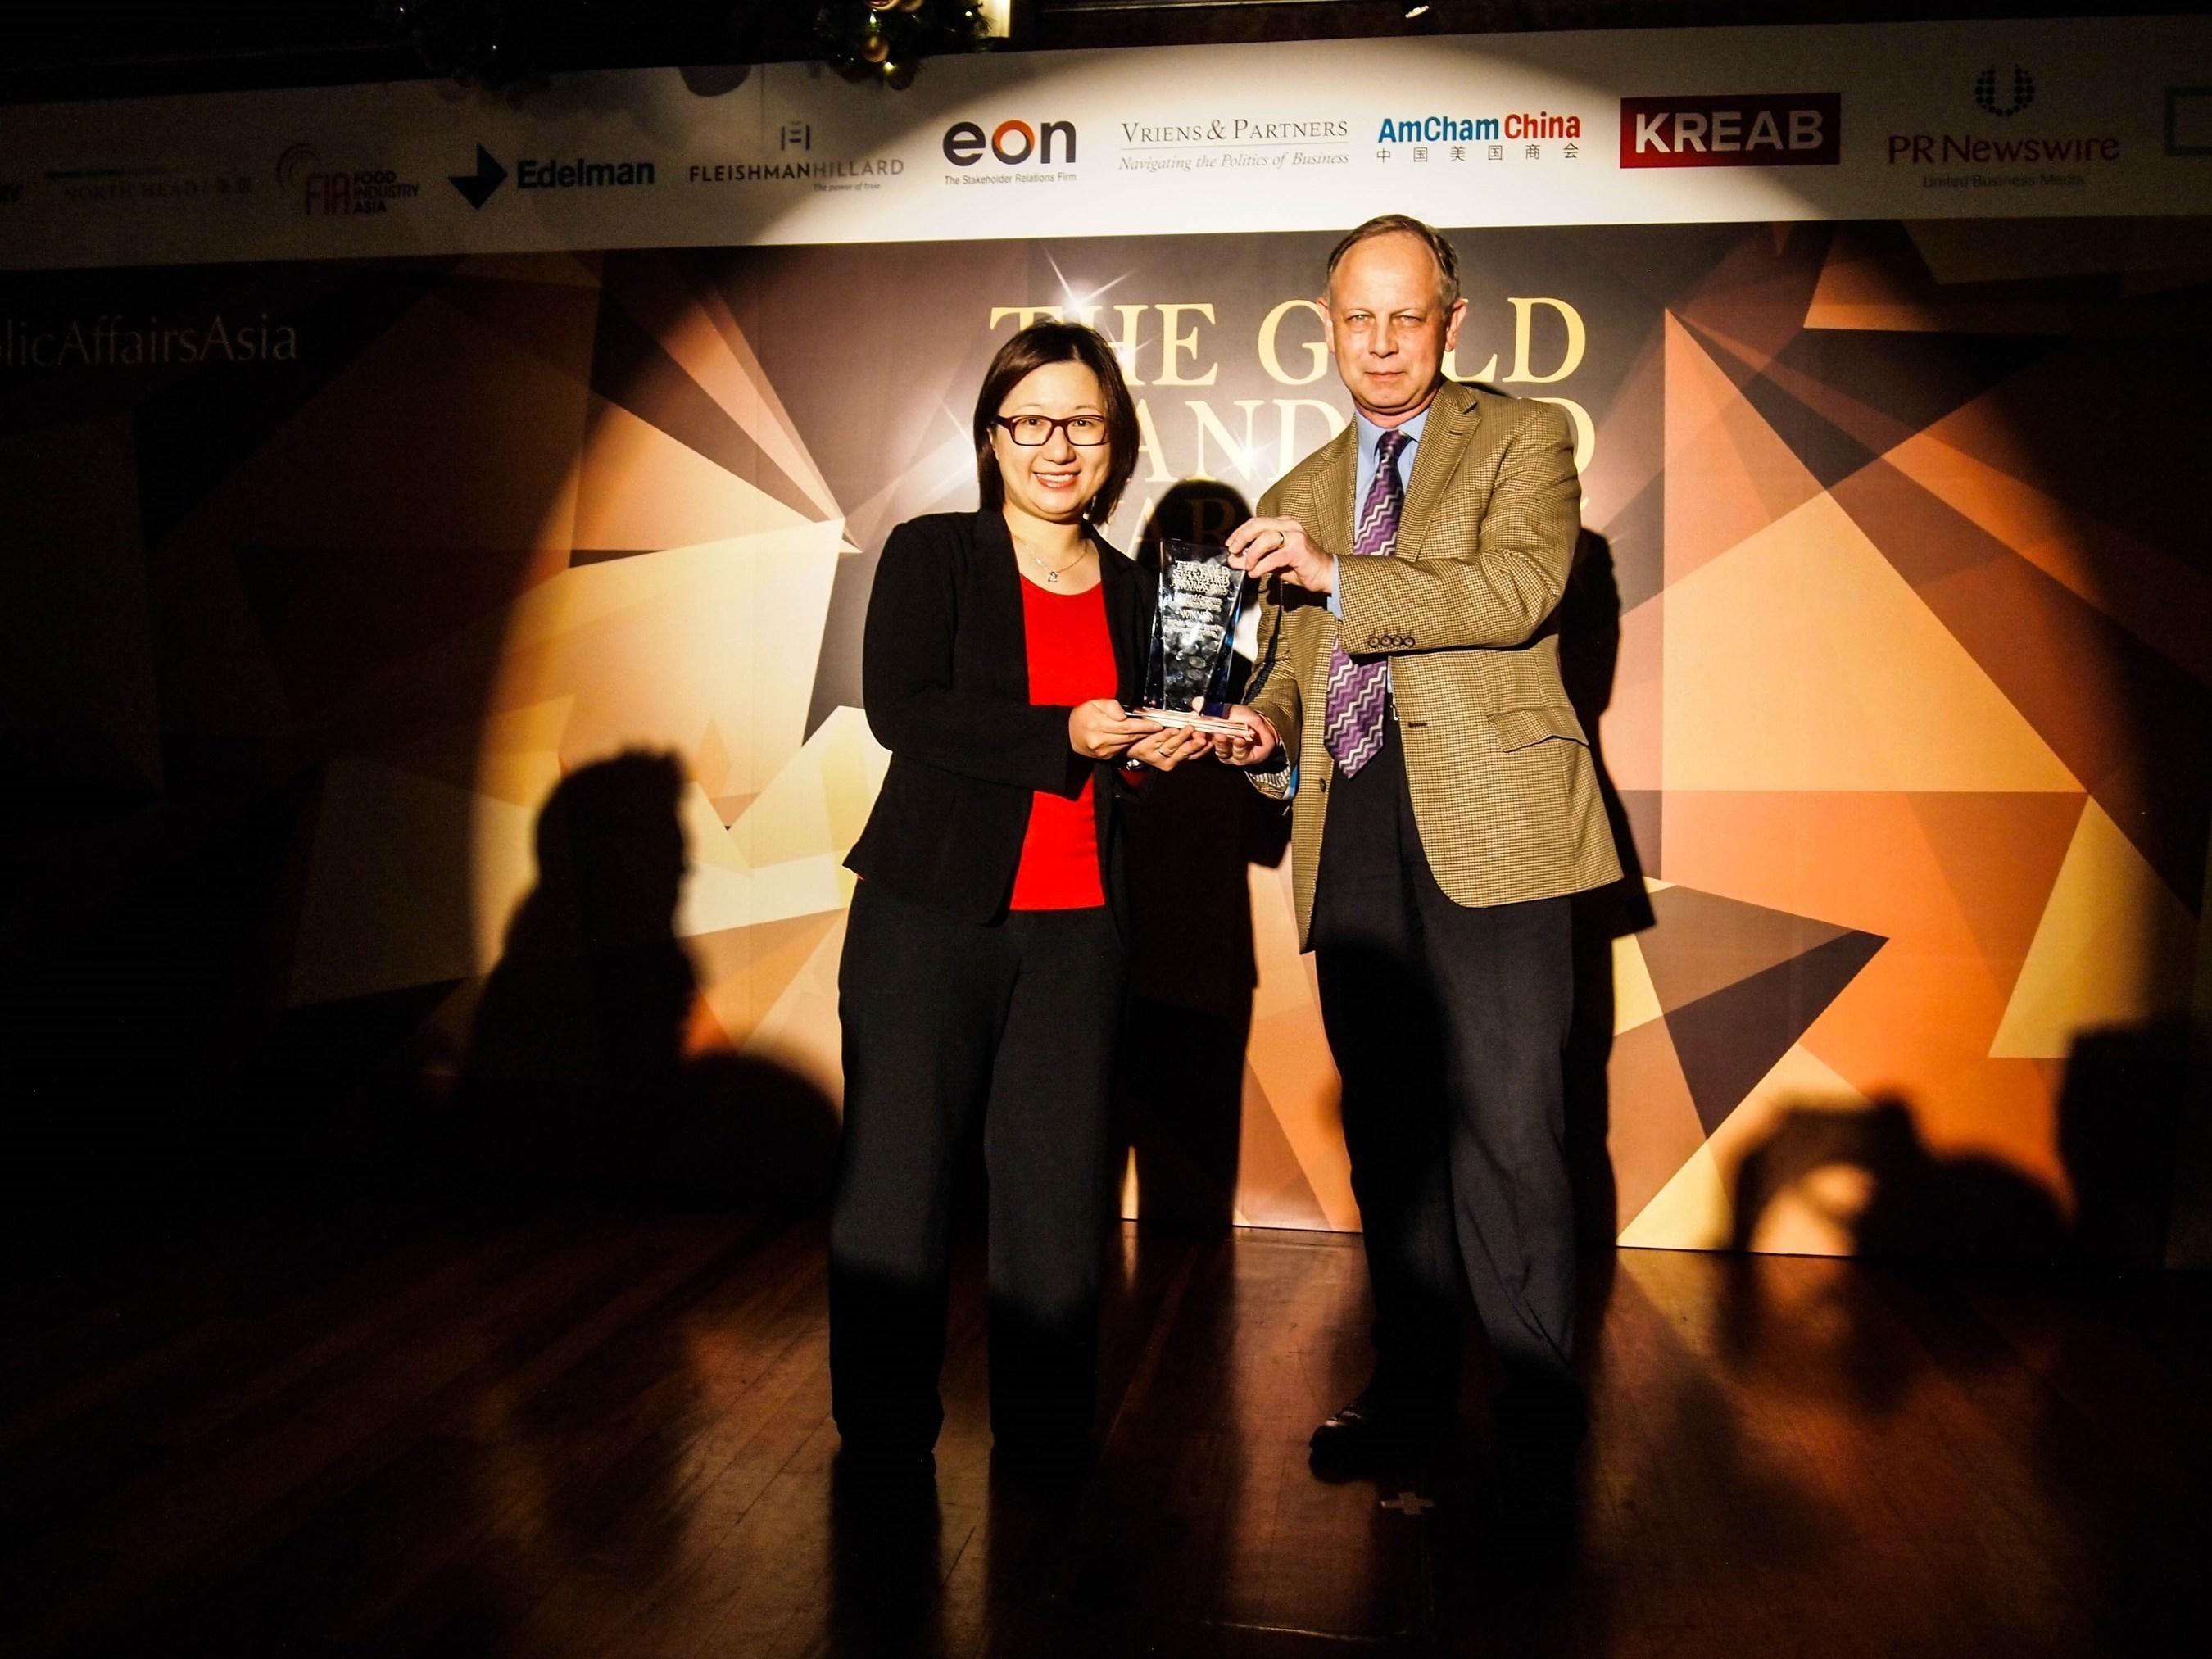 FrieslandCampina Asia receives the prestigious PublicAffairsAsia Gold Standard Award 2015 at an award ceremony ...